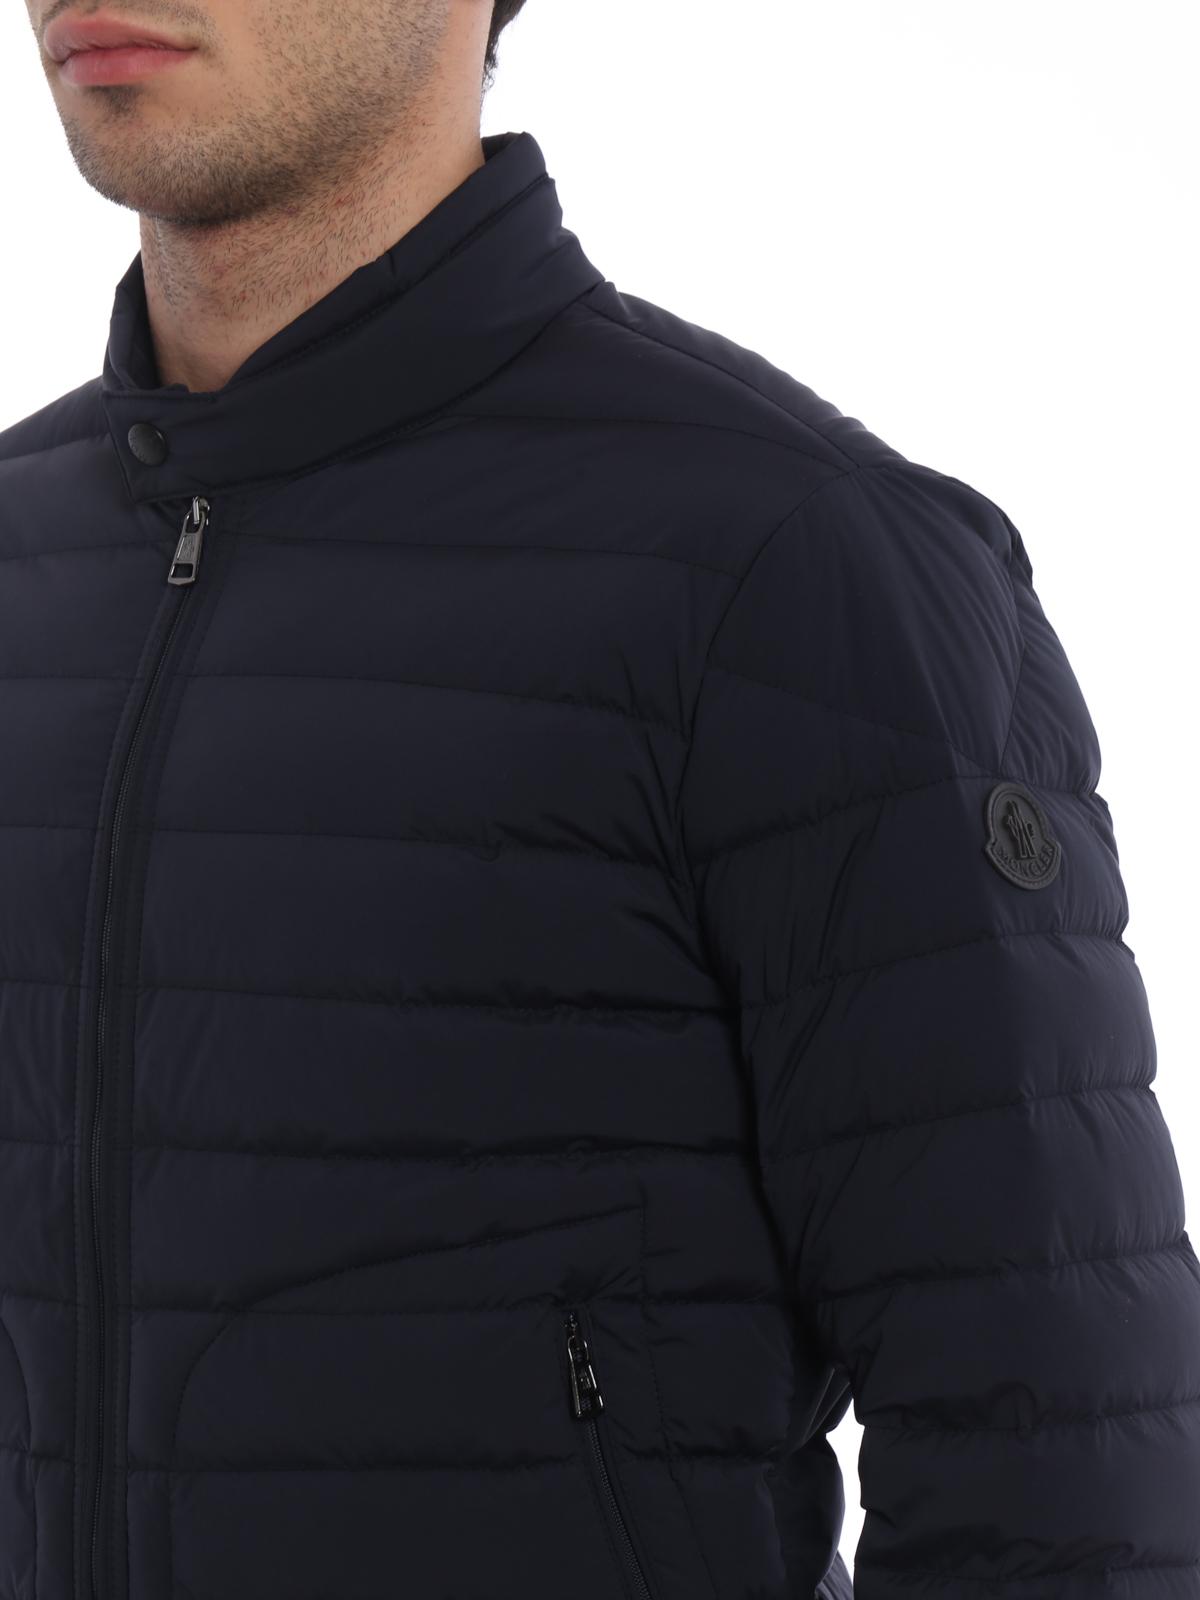 3f97b9504 Moncler - Acorus stretch puffer jacket - padded jackets - D1 091 ...